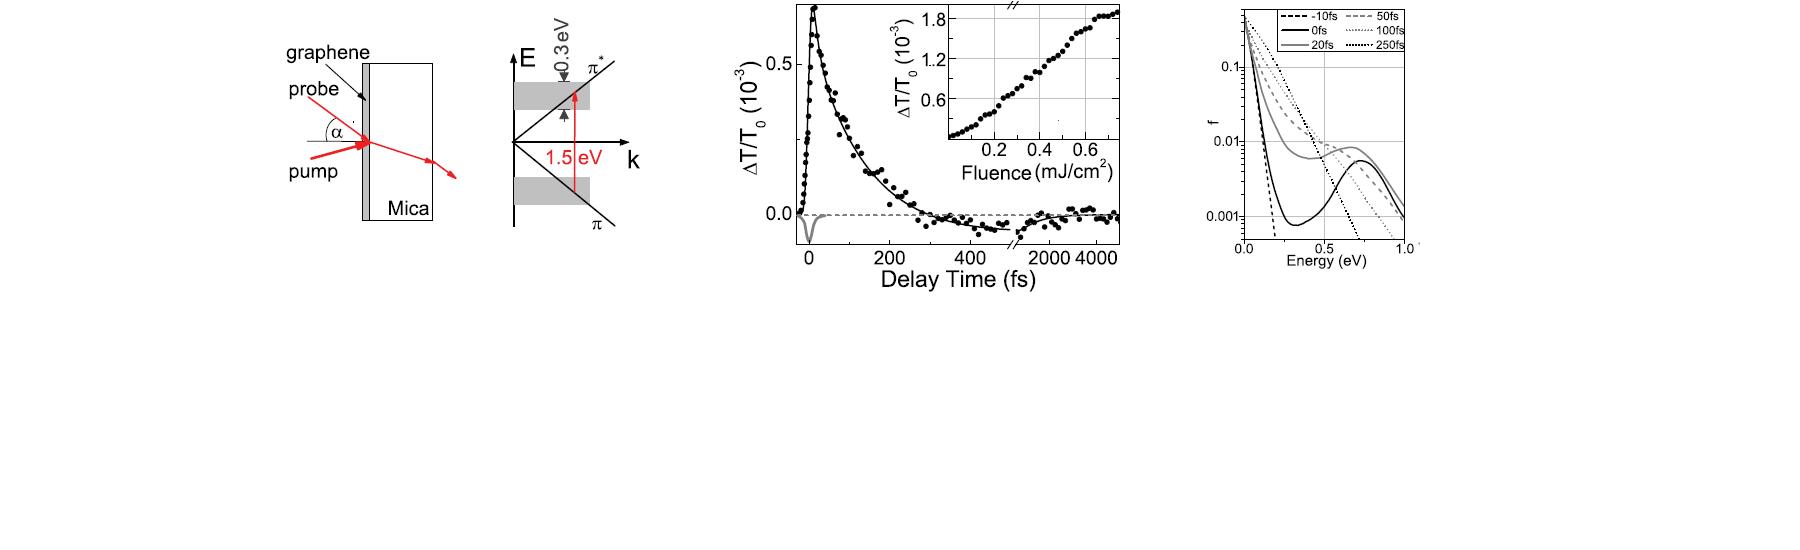 physics_ultrafast_noneq_car_dyn_graph_layer.png